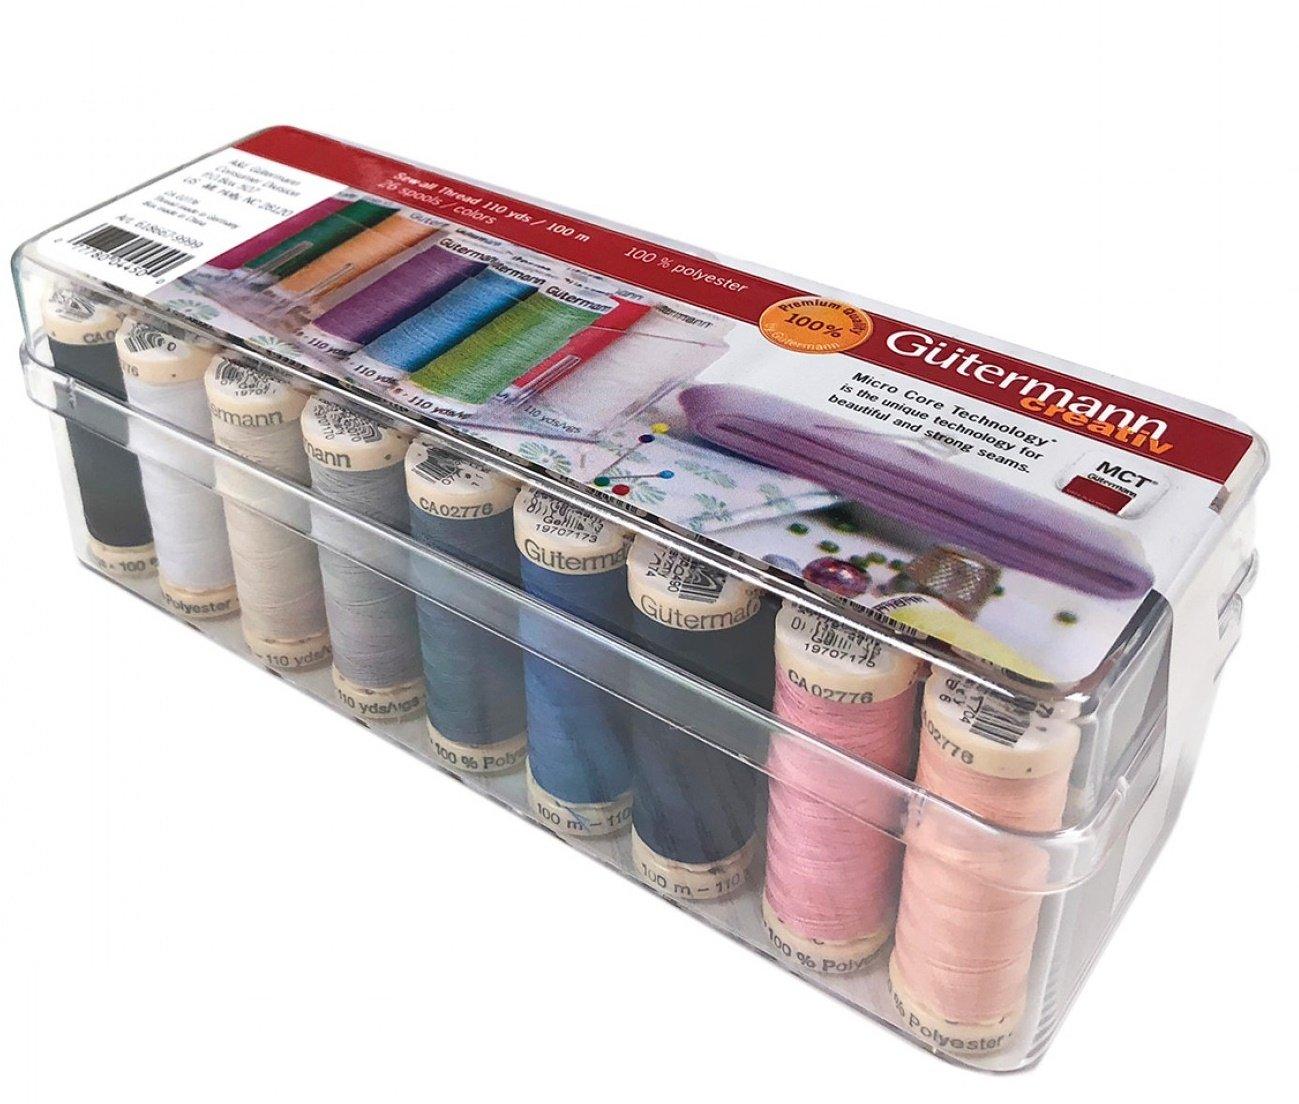 Gutermann Creativ Thread - 618667-9999 26 Spool Sew-All Thread Box - 26 Colors